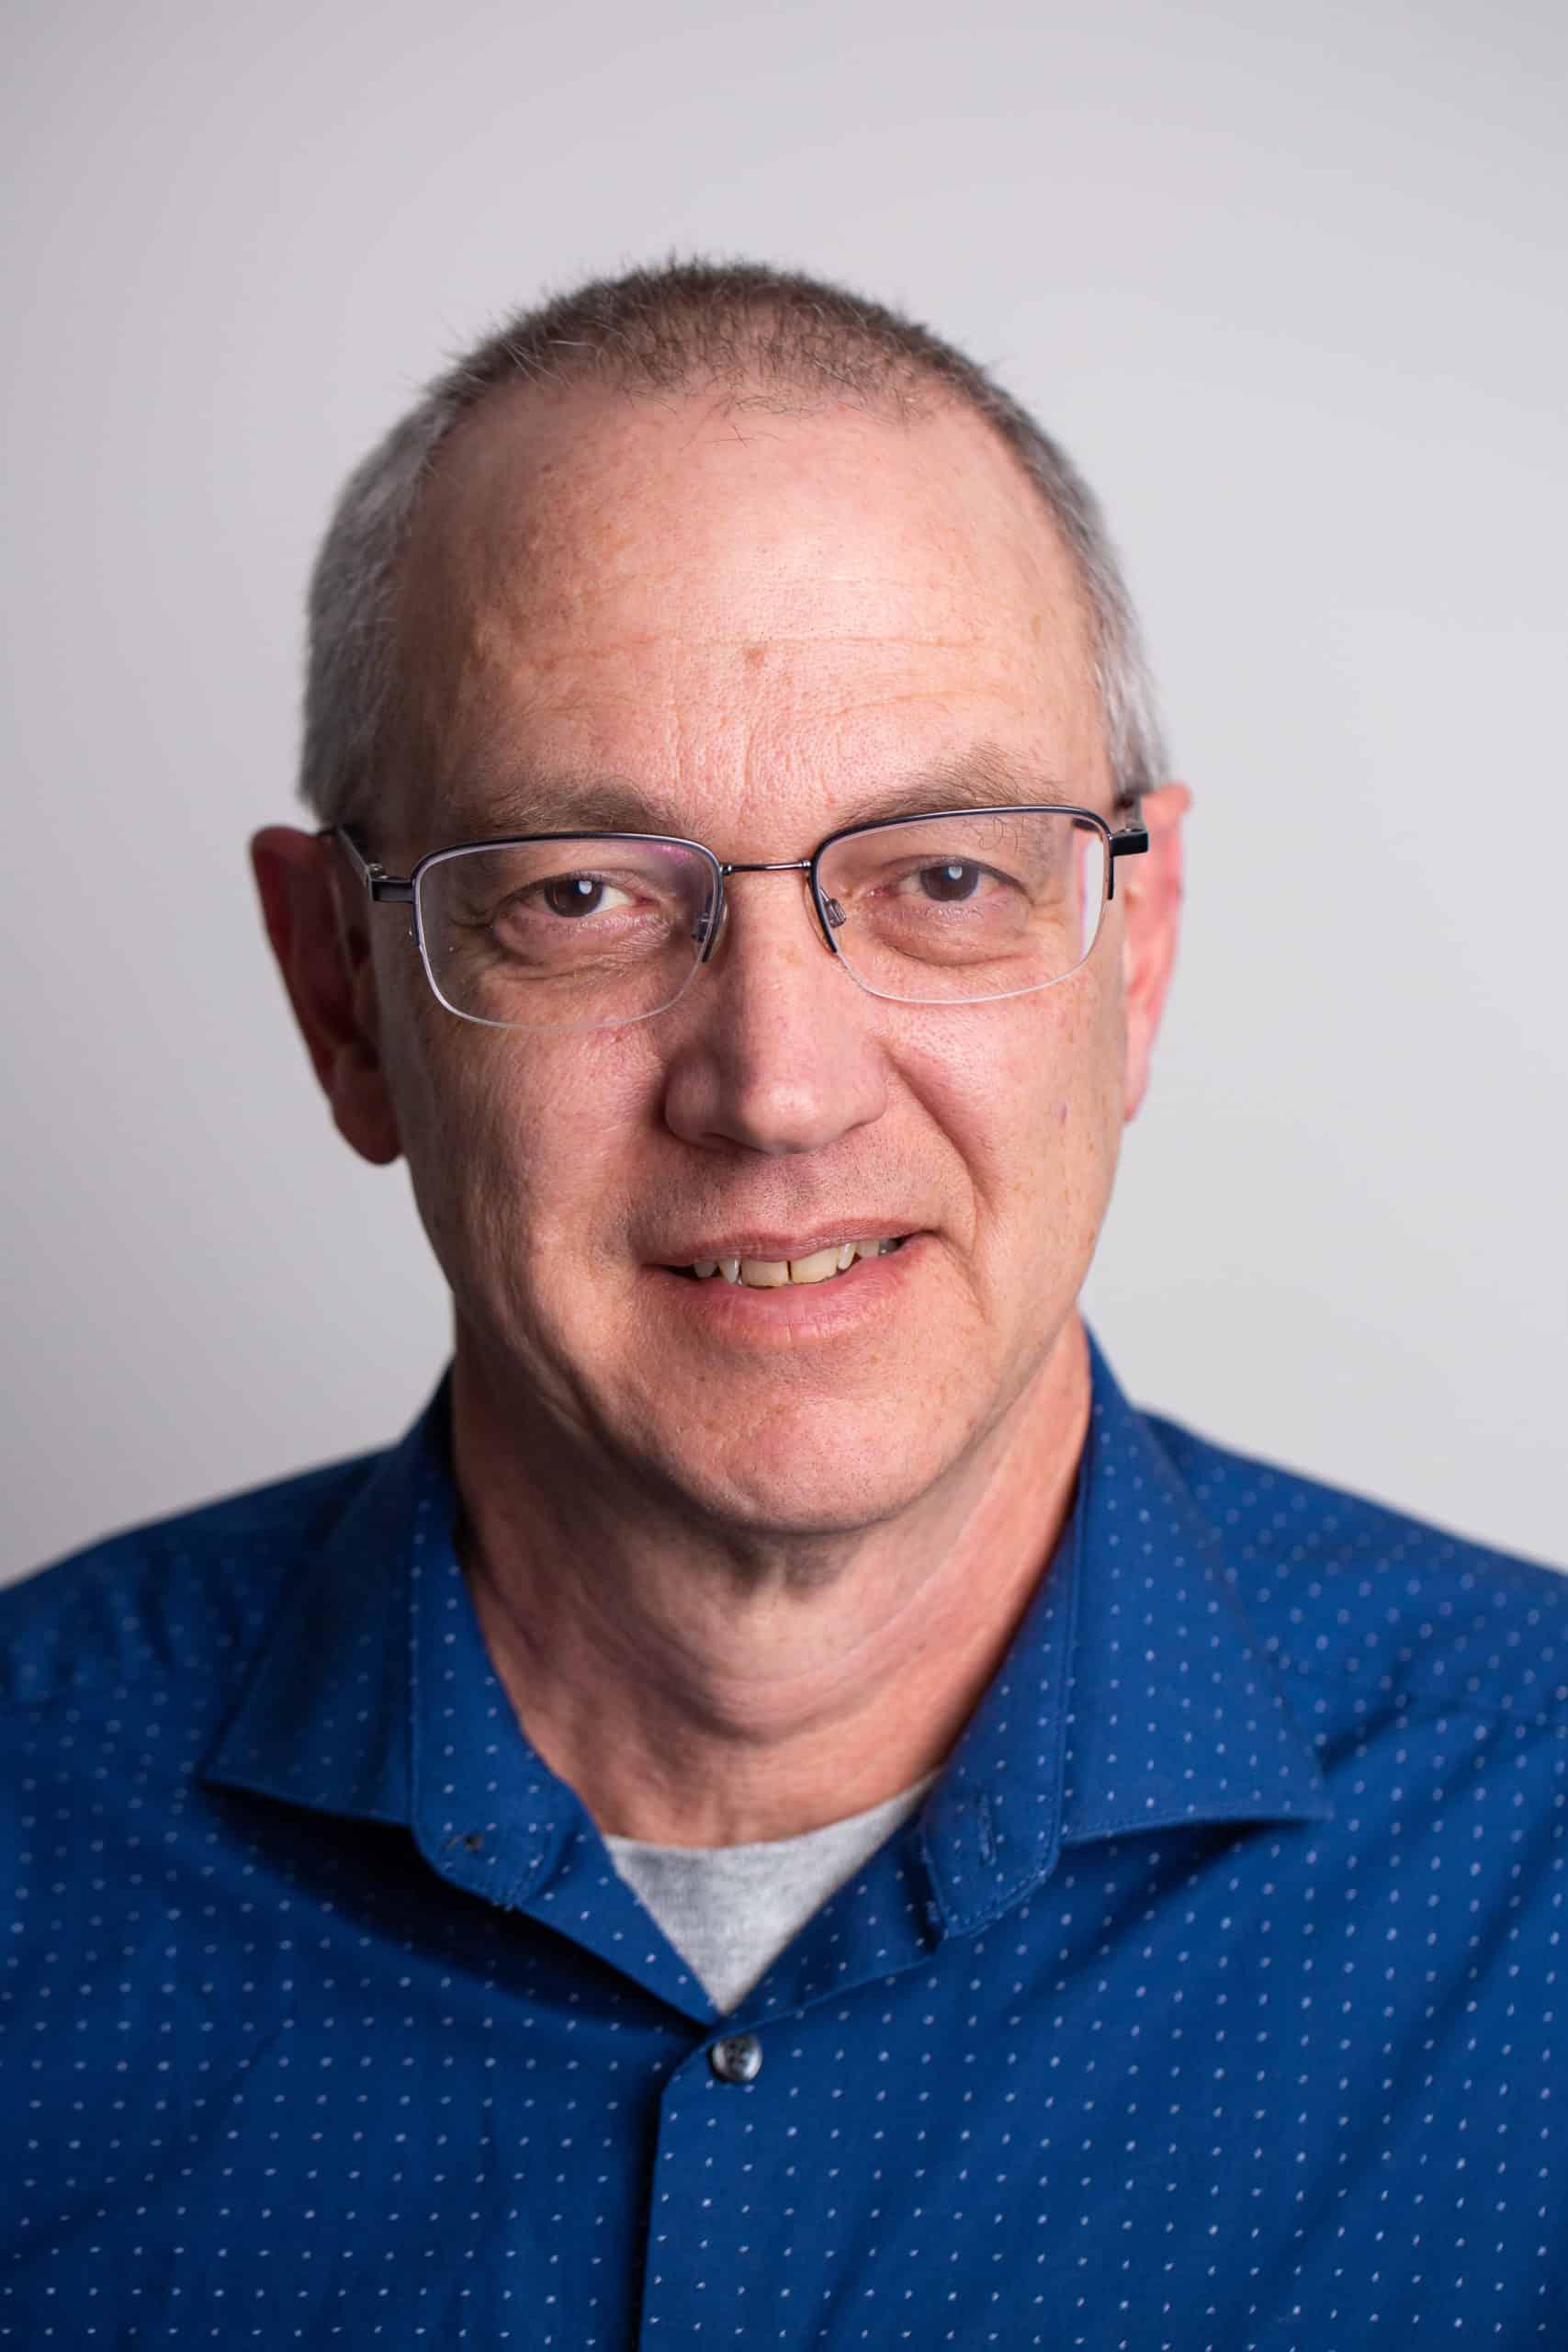 Headshot of Steve Miles - VP Operations